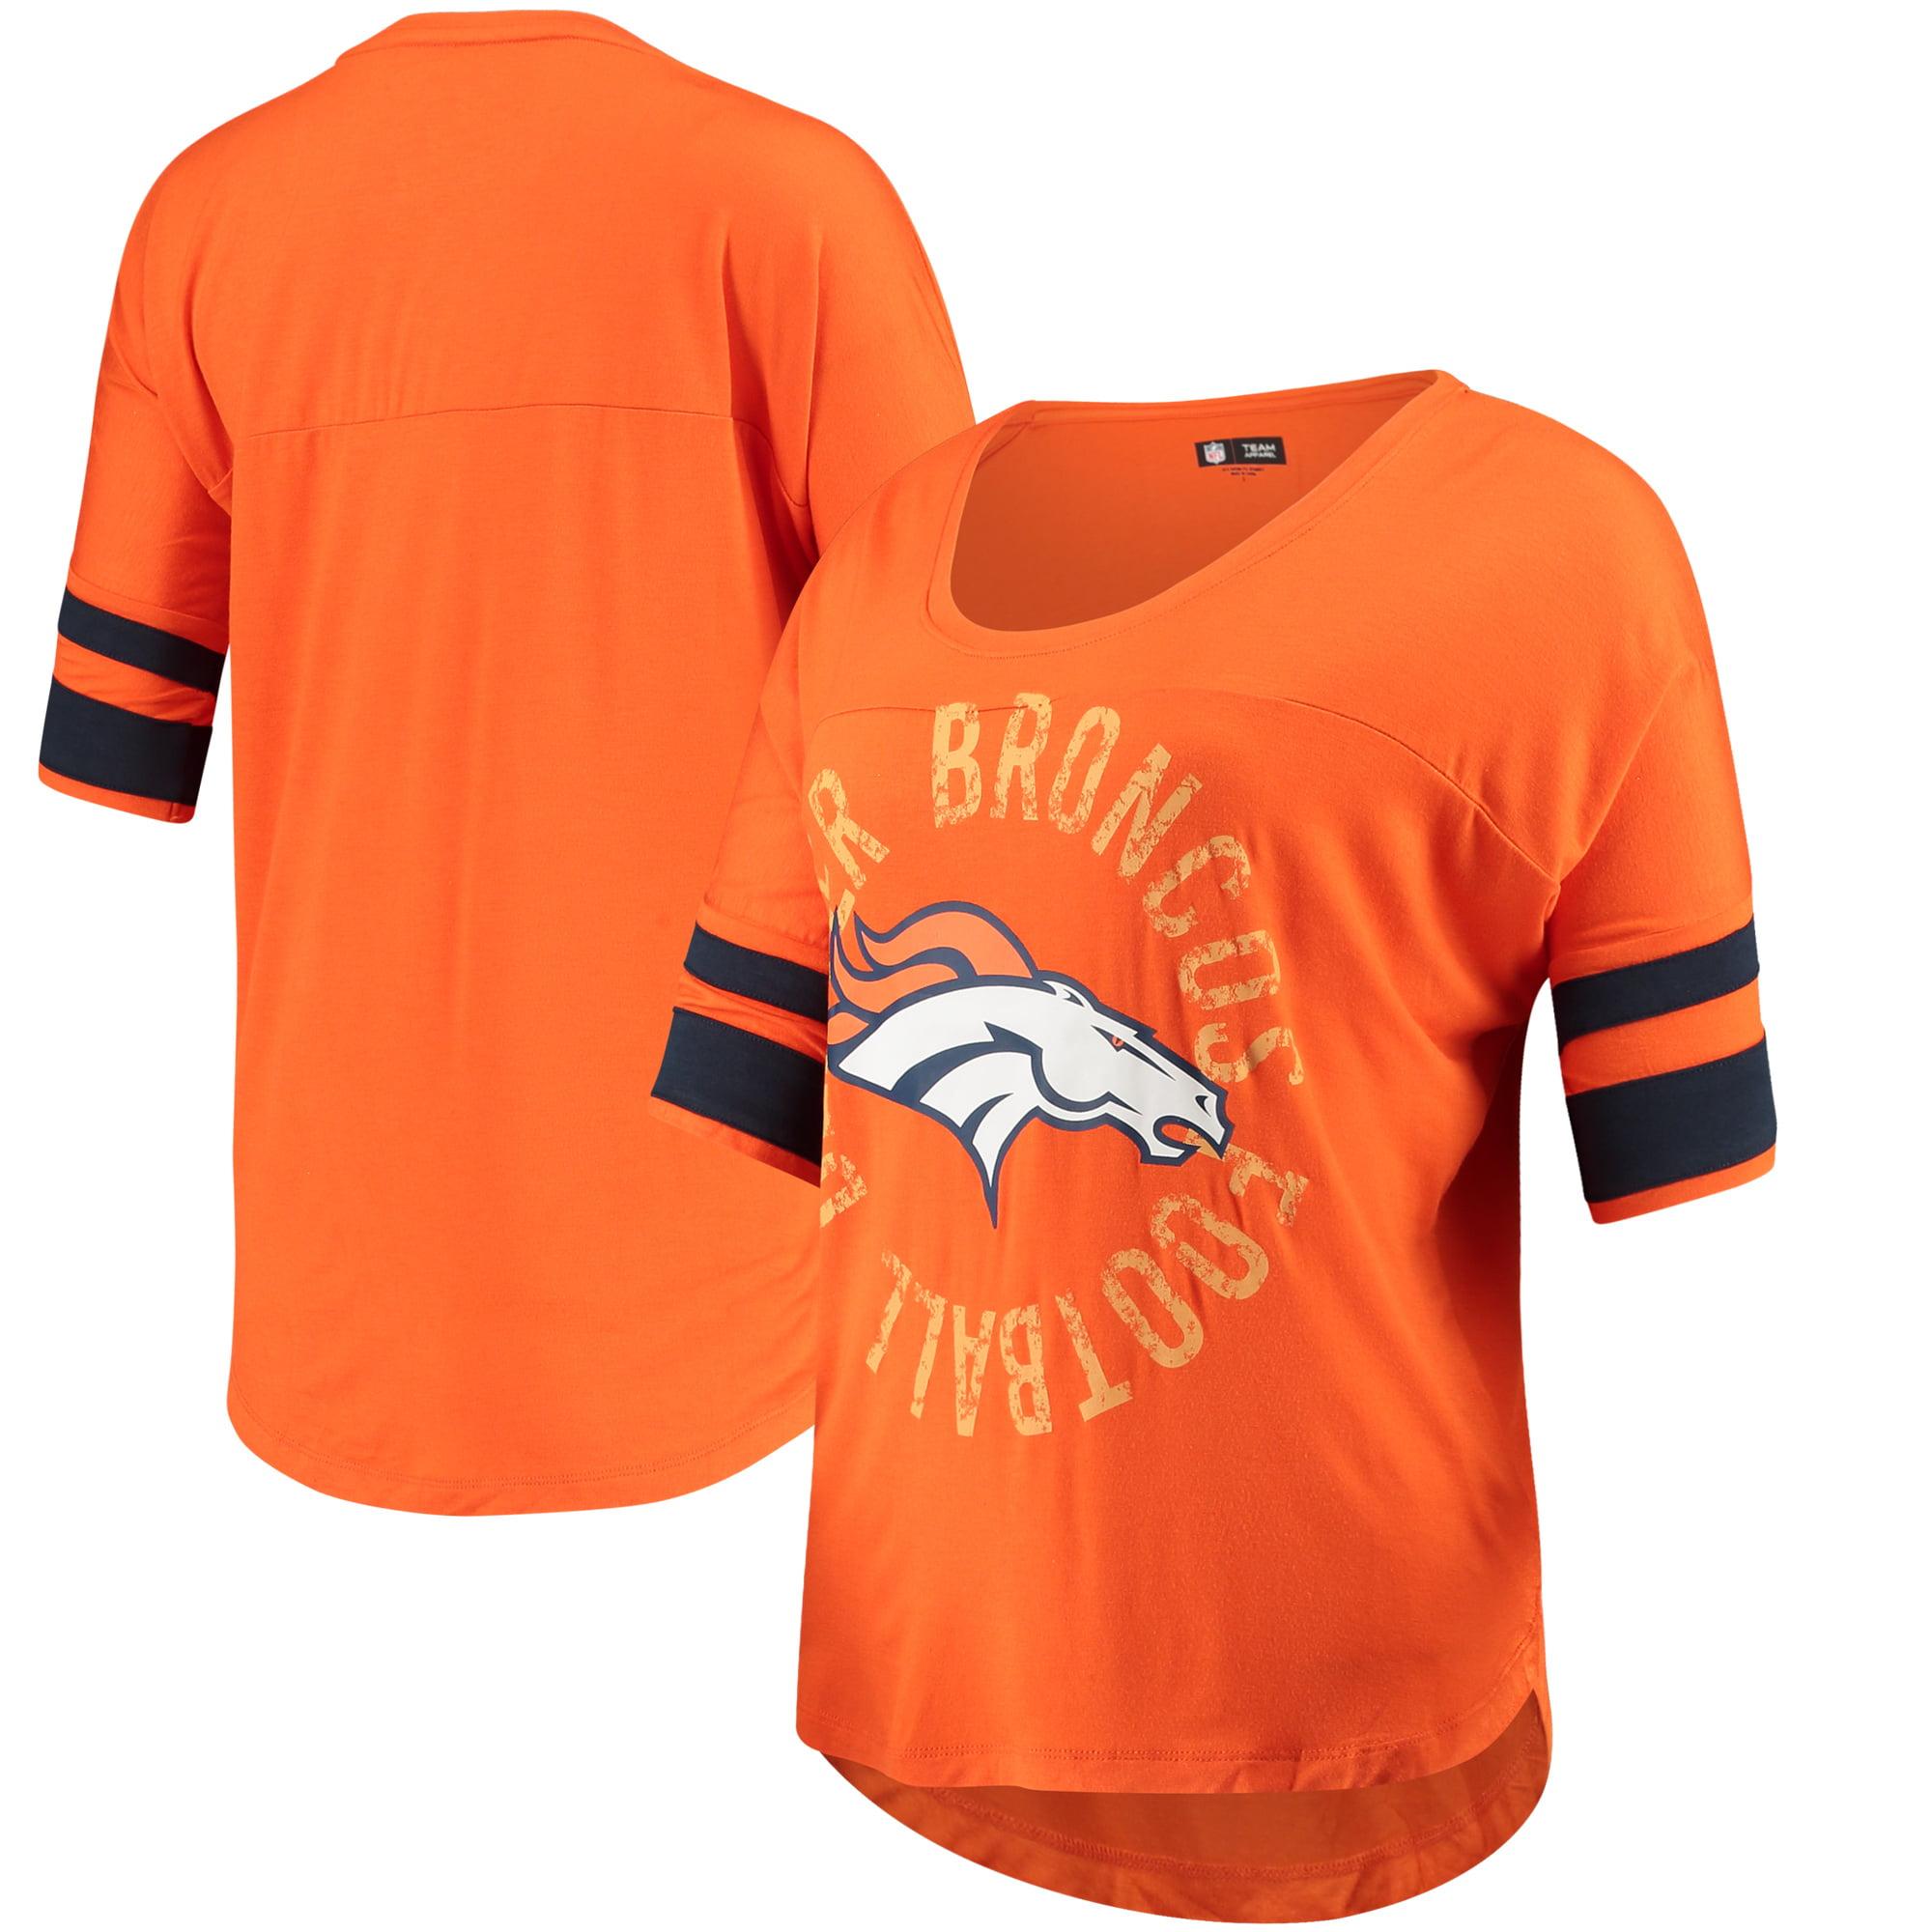 Denver Broncos 5th & Ocean by New Era Women's Novelty Dolman Sleeve Scoop Neck T-Shirt - Orange